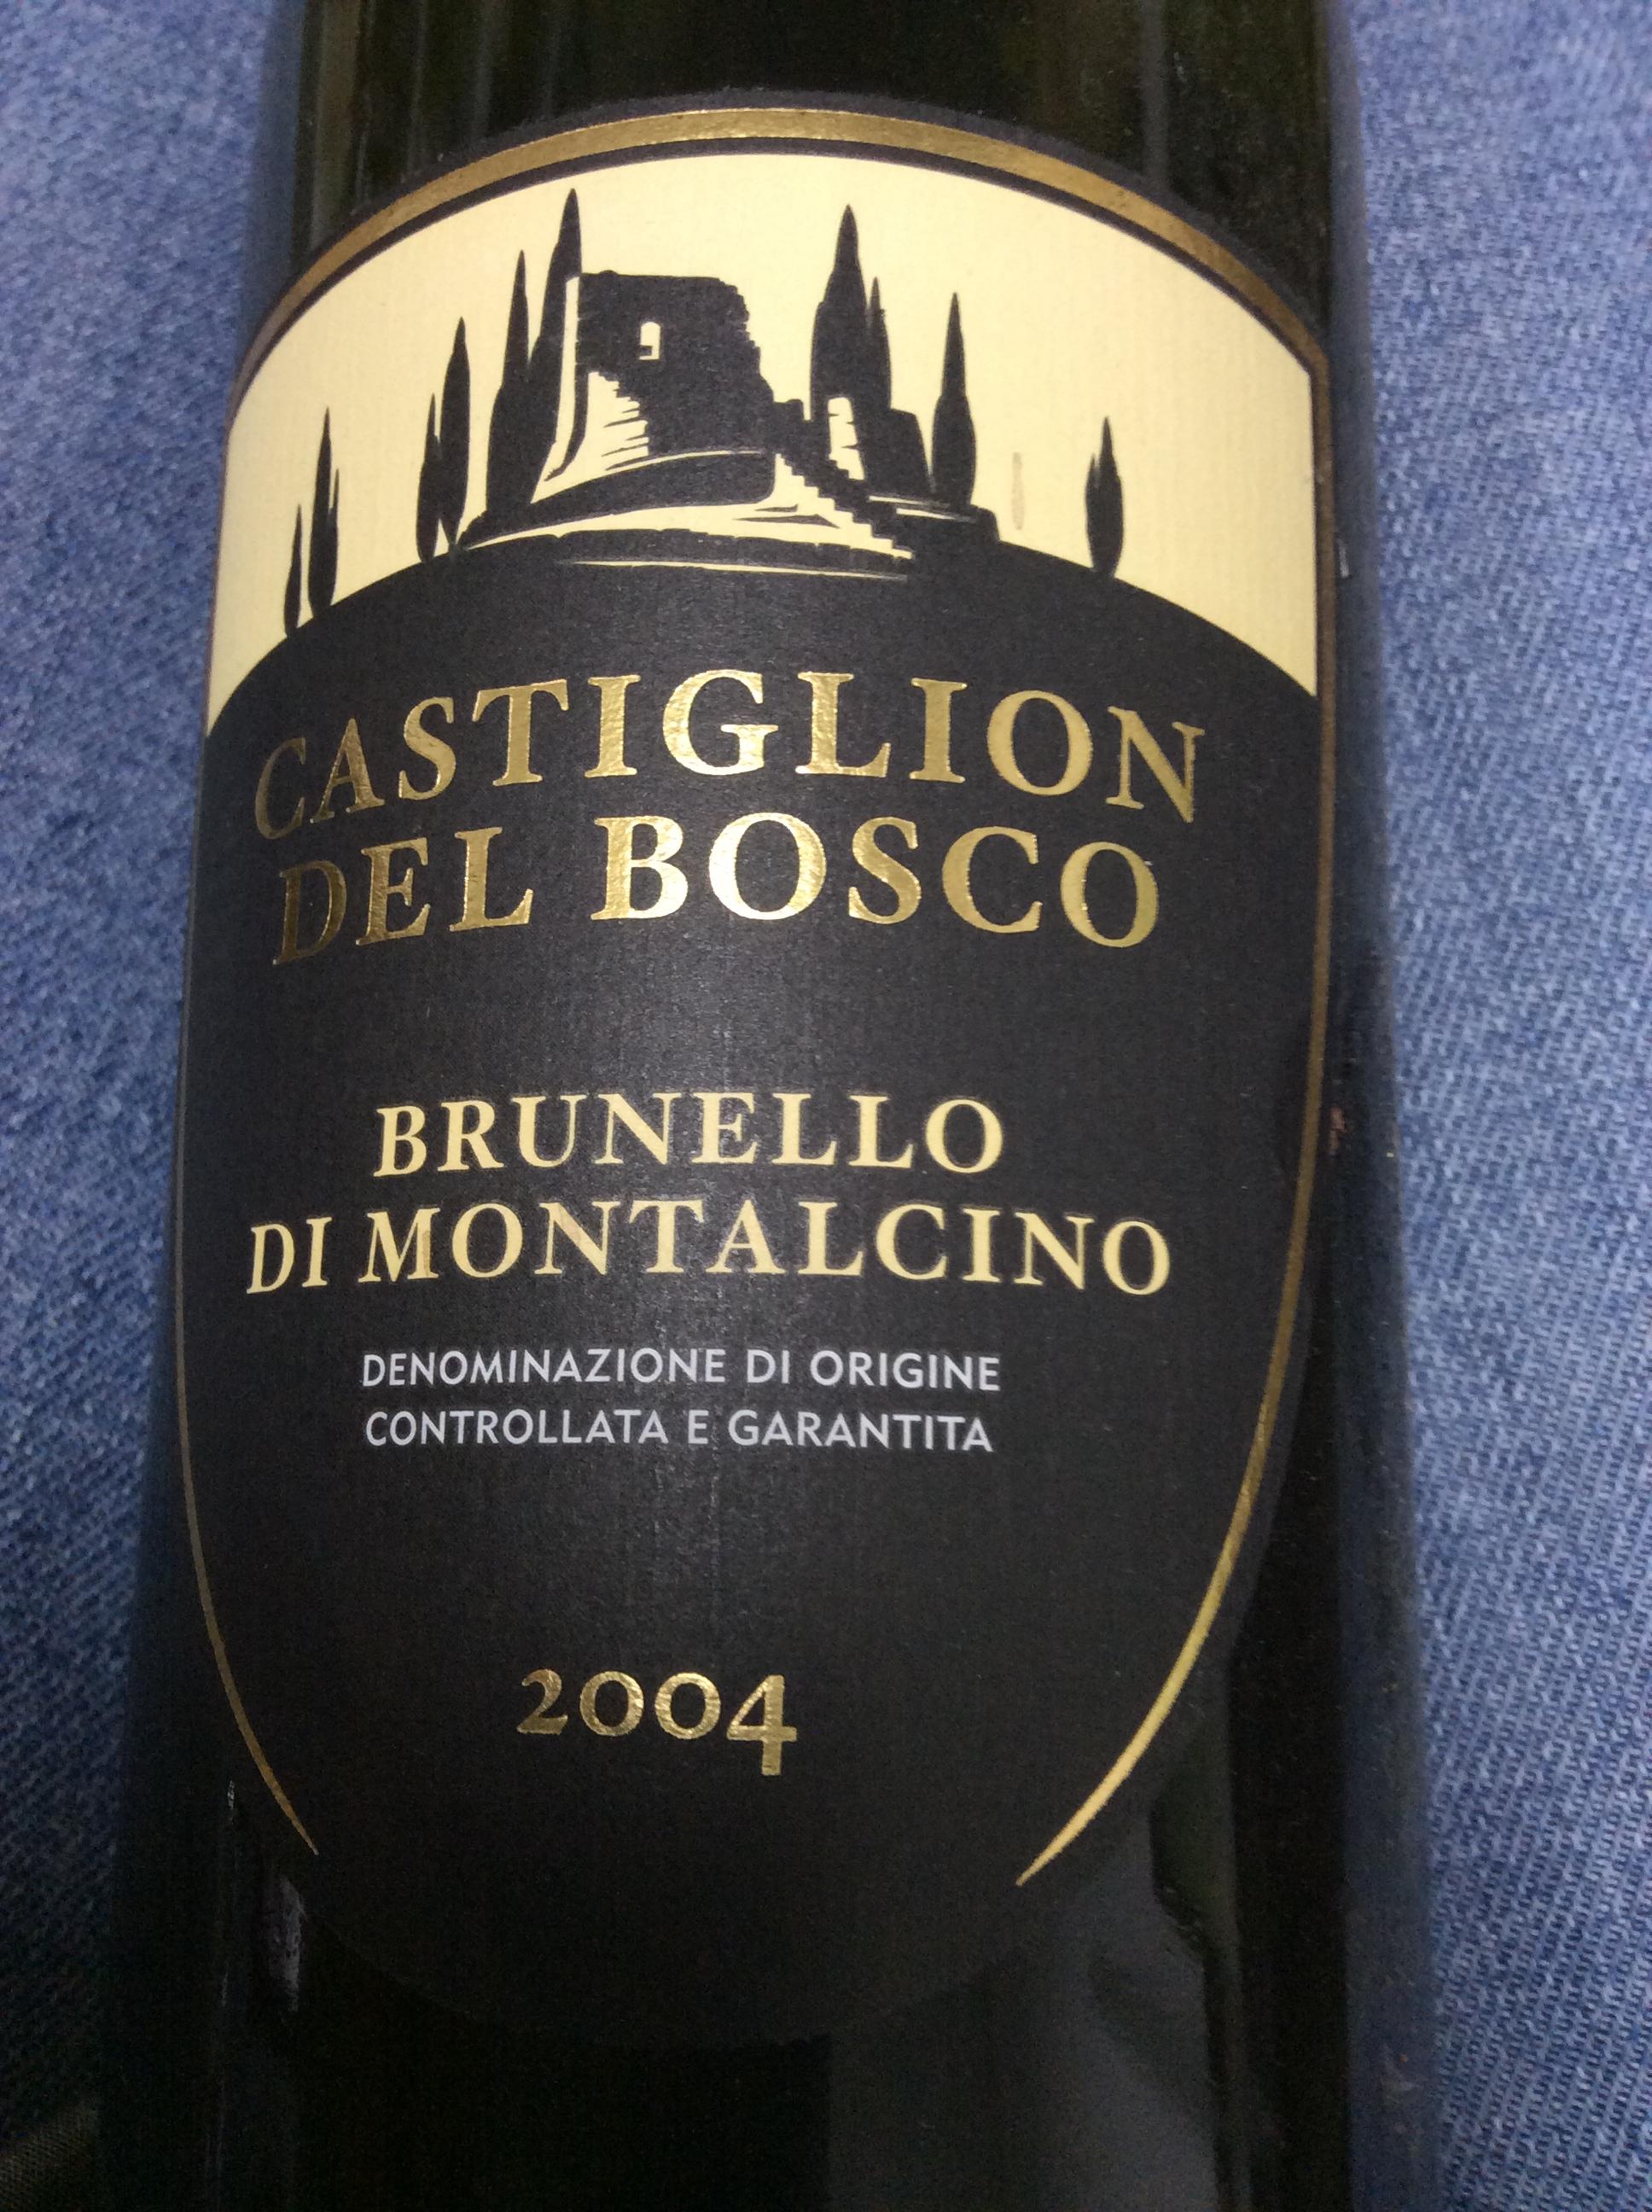 卡斯蒂利奥内布鲁耐罗干红Castiglione del Bosco brunello di montalcino